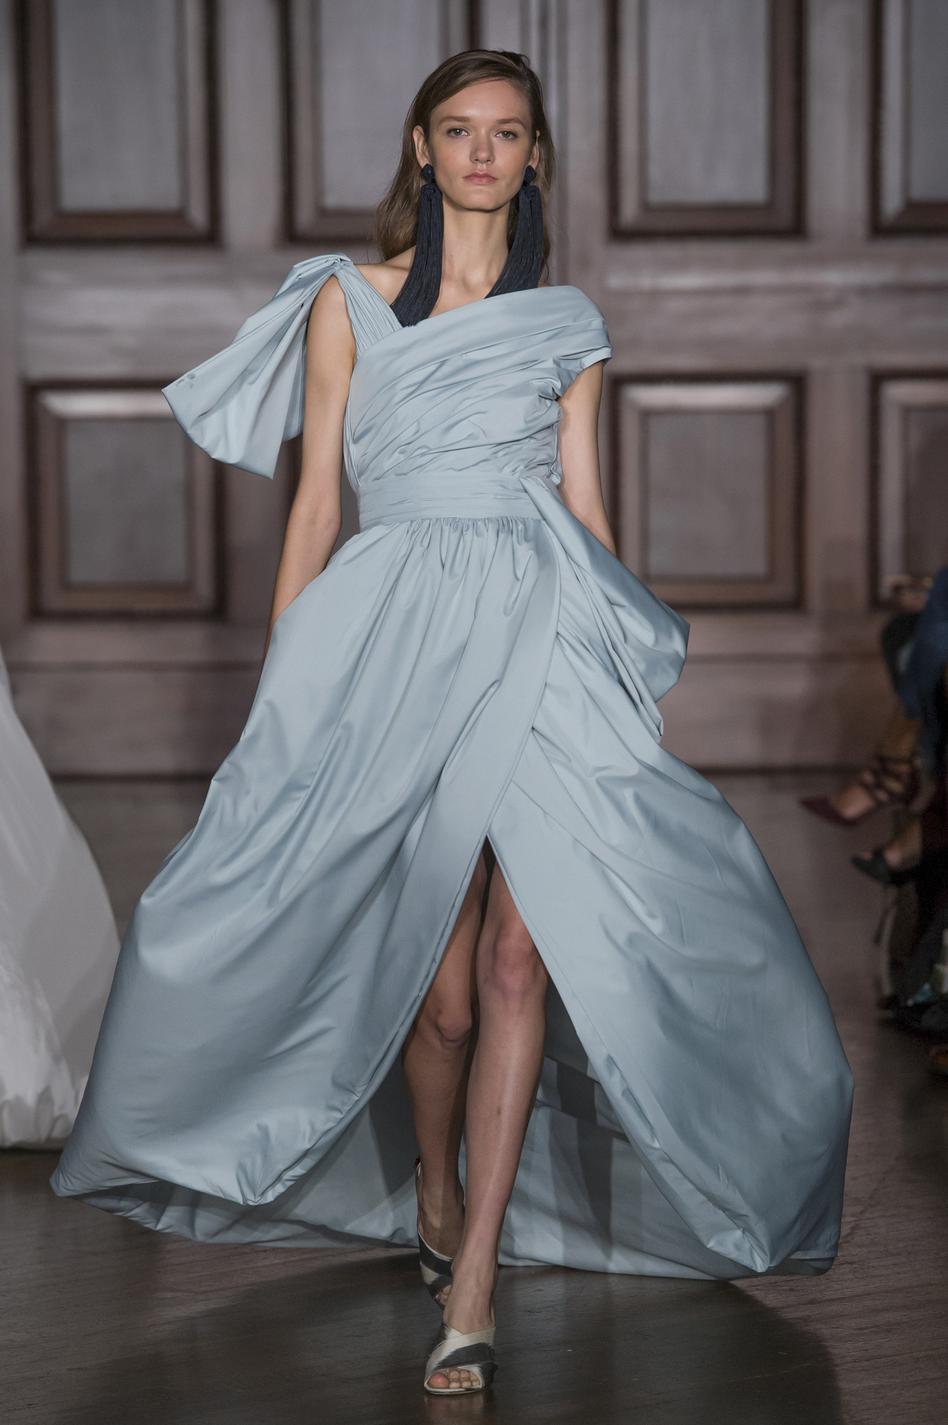 ... Les plus belles robes du soir de la Fashion Week printemps-été 2018 -  Sachin   Babi ... 4ba52fc032e